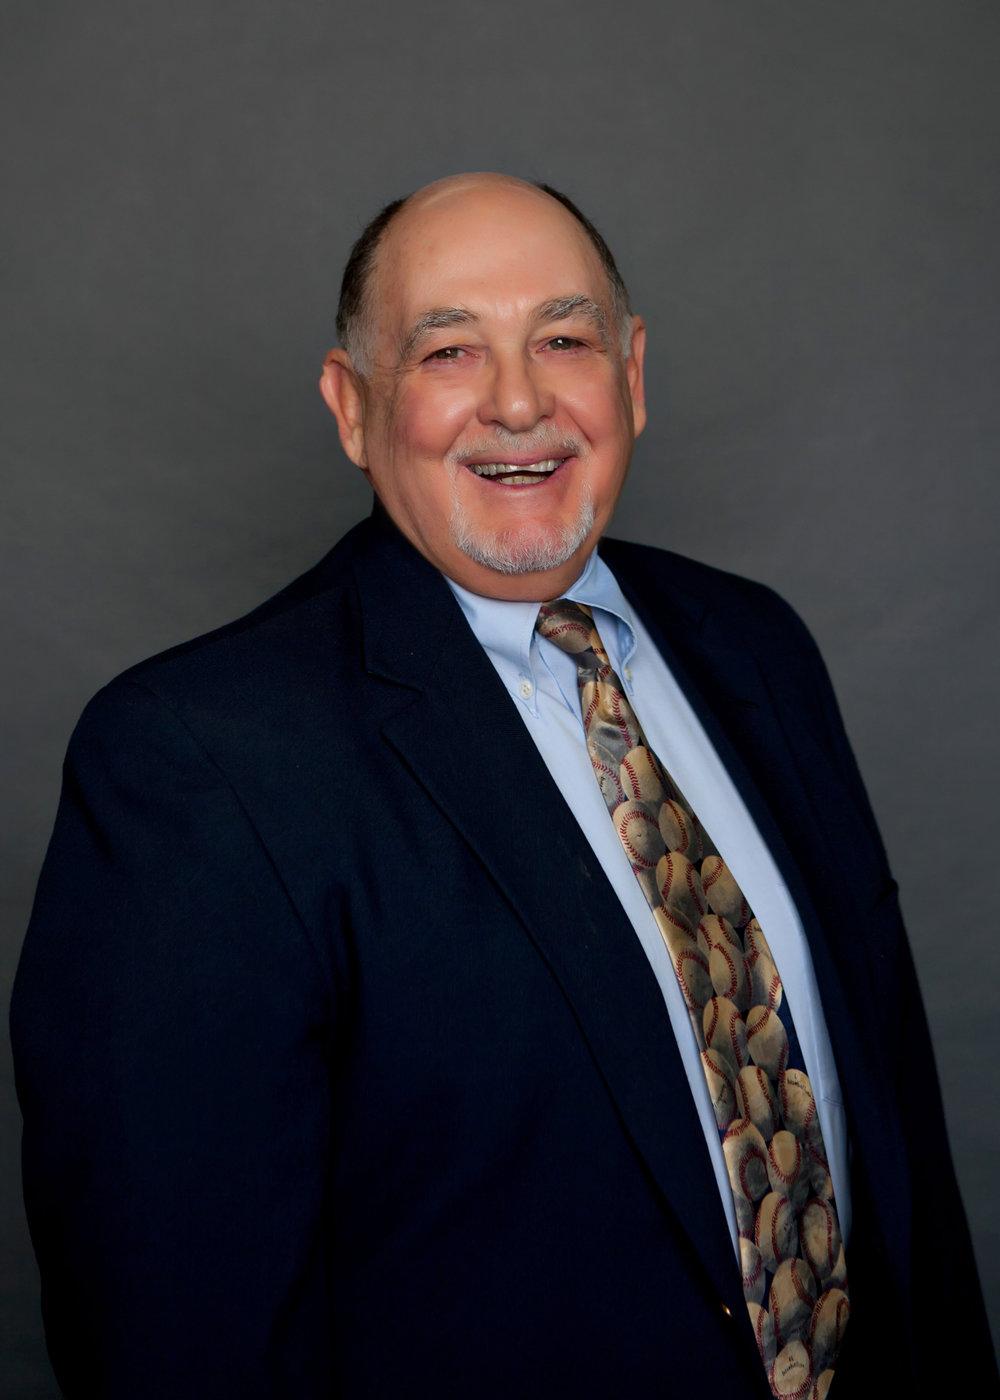 Joseph P. Rice, III, Attorney - jrice@capelawfirm.com